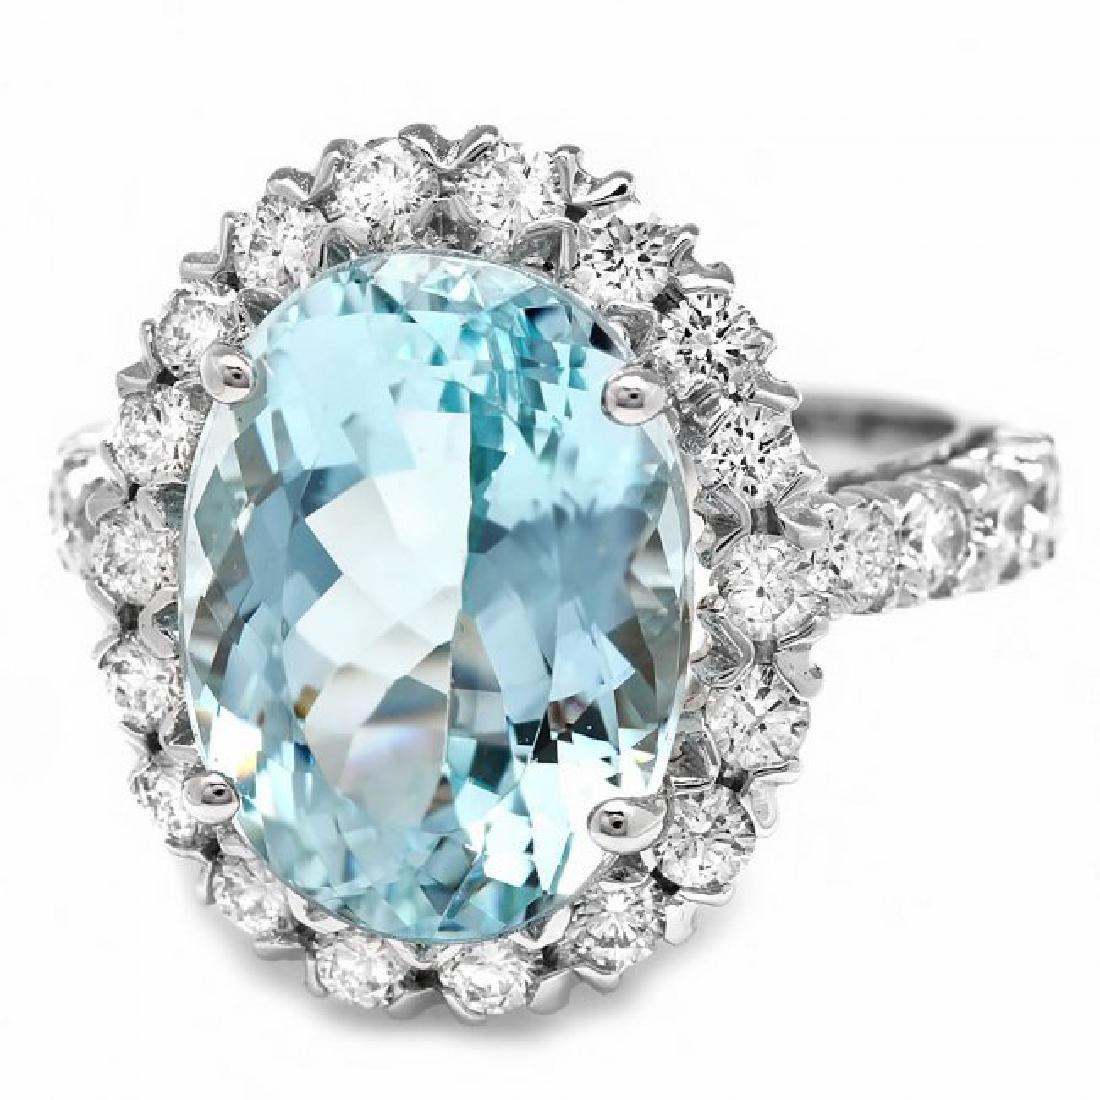 14k Gold 7.70ct Aquamarine 1.27ct Diamond Ring - 2